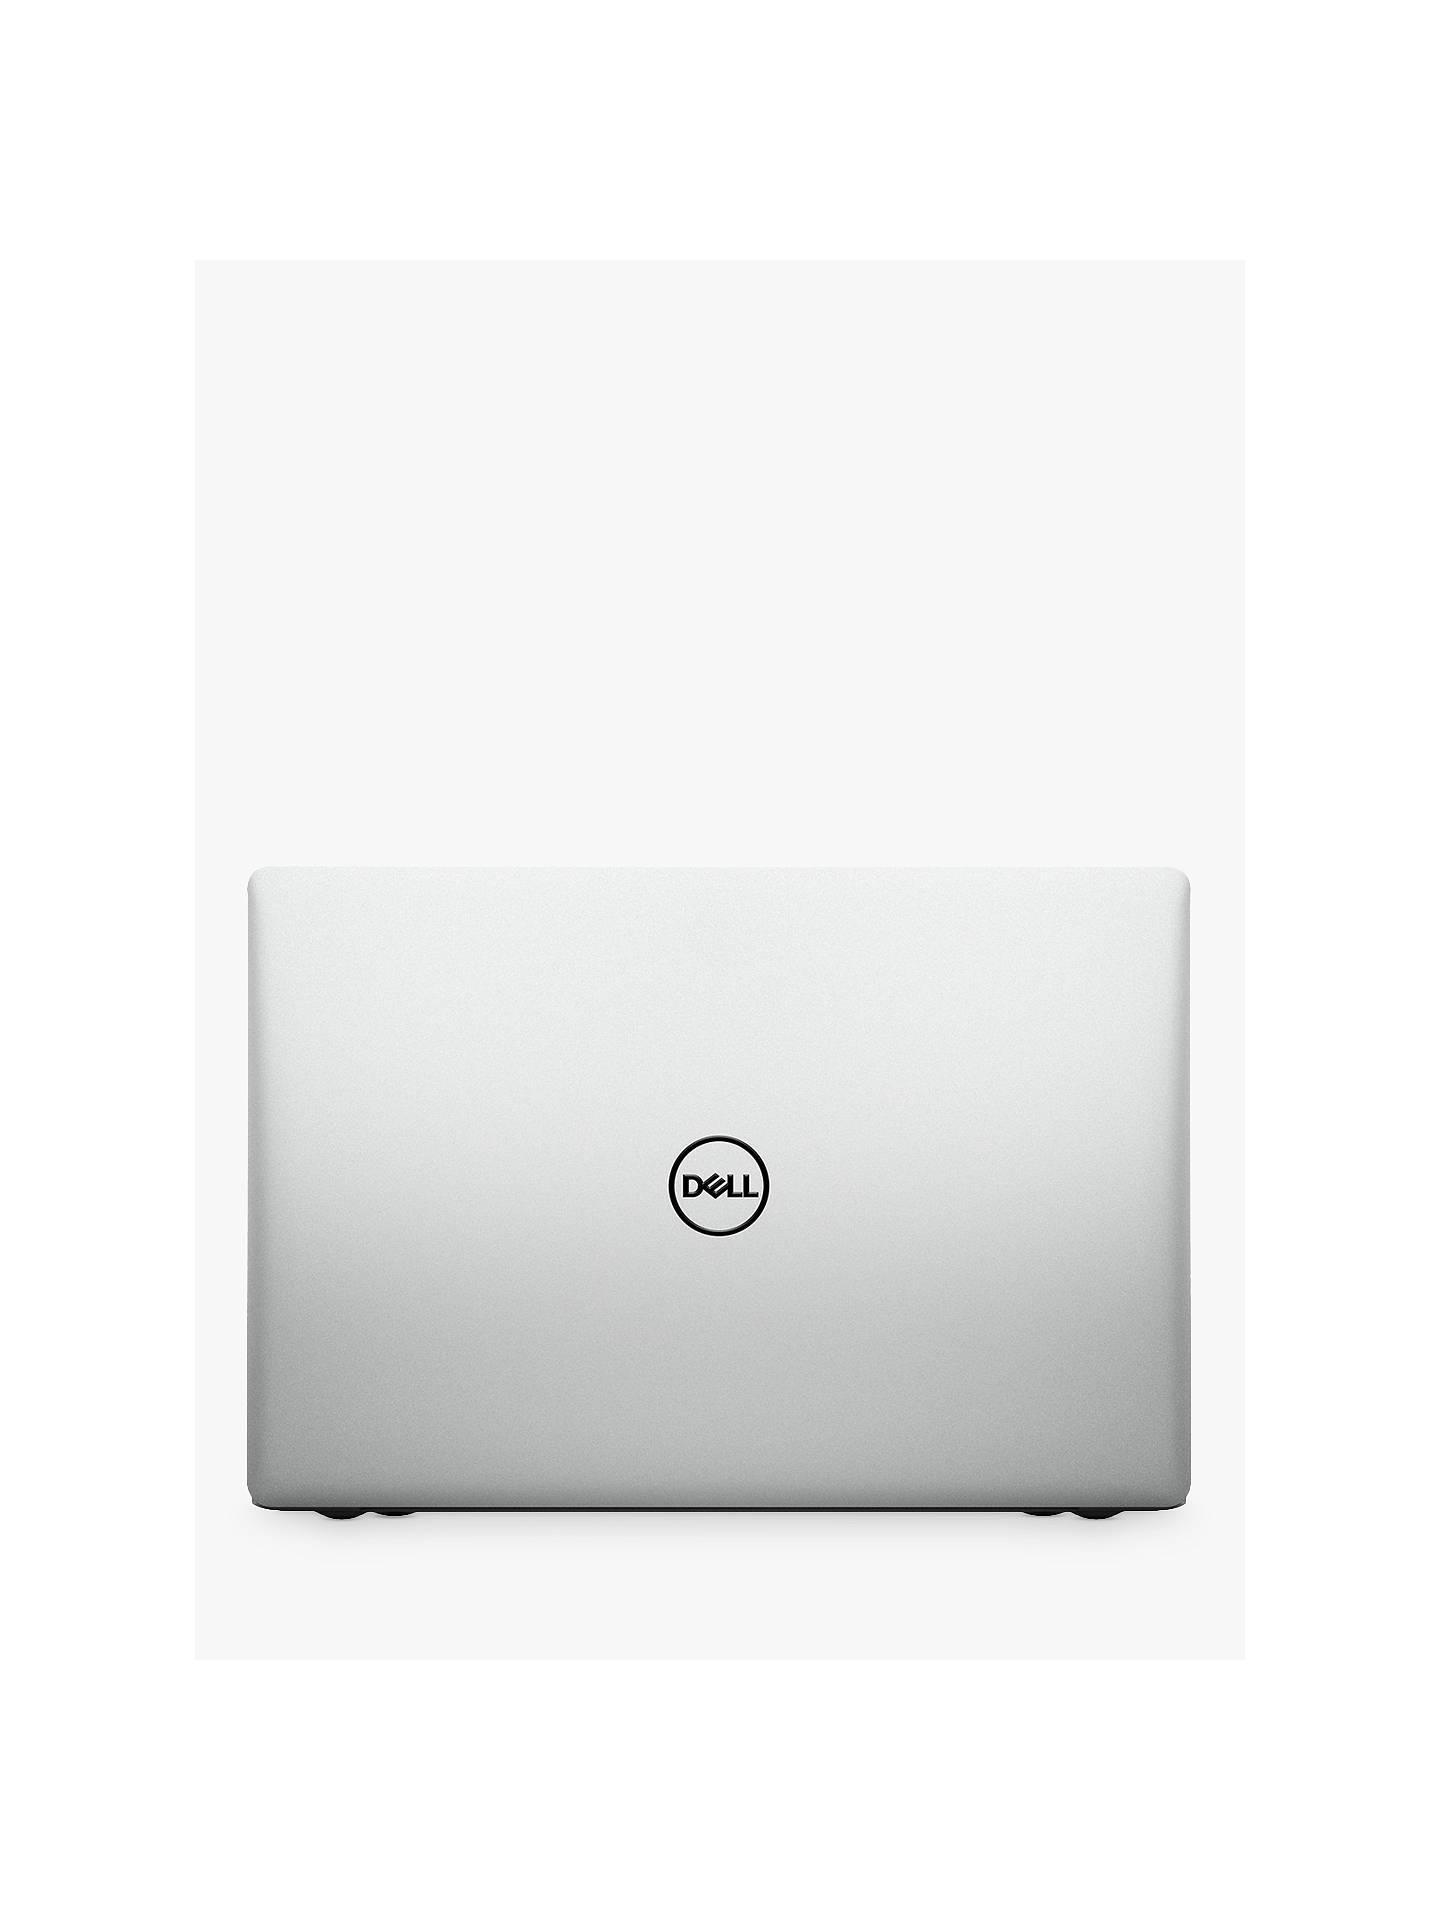 Dell Inspiron 15 5570 Laptop Intel Core I7 16gb Ram Amd Radeon